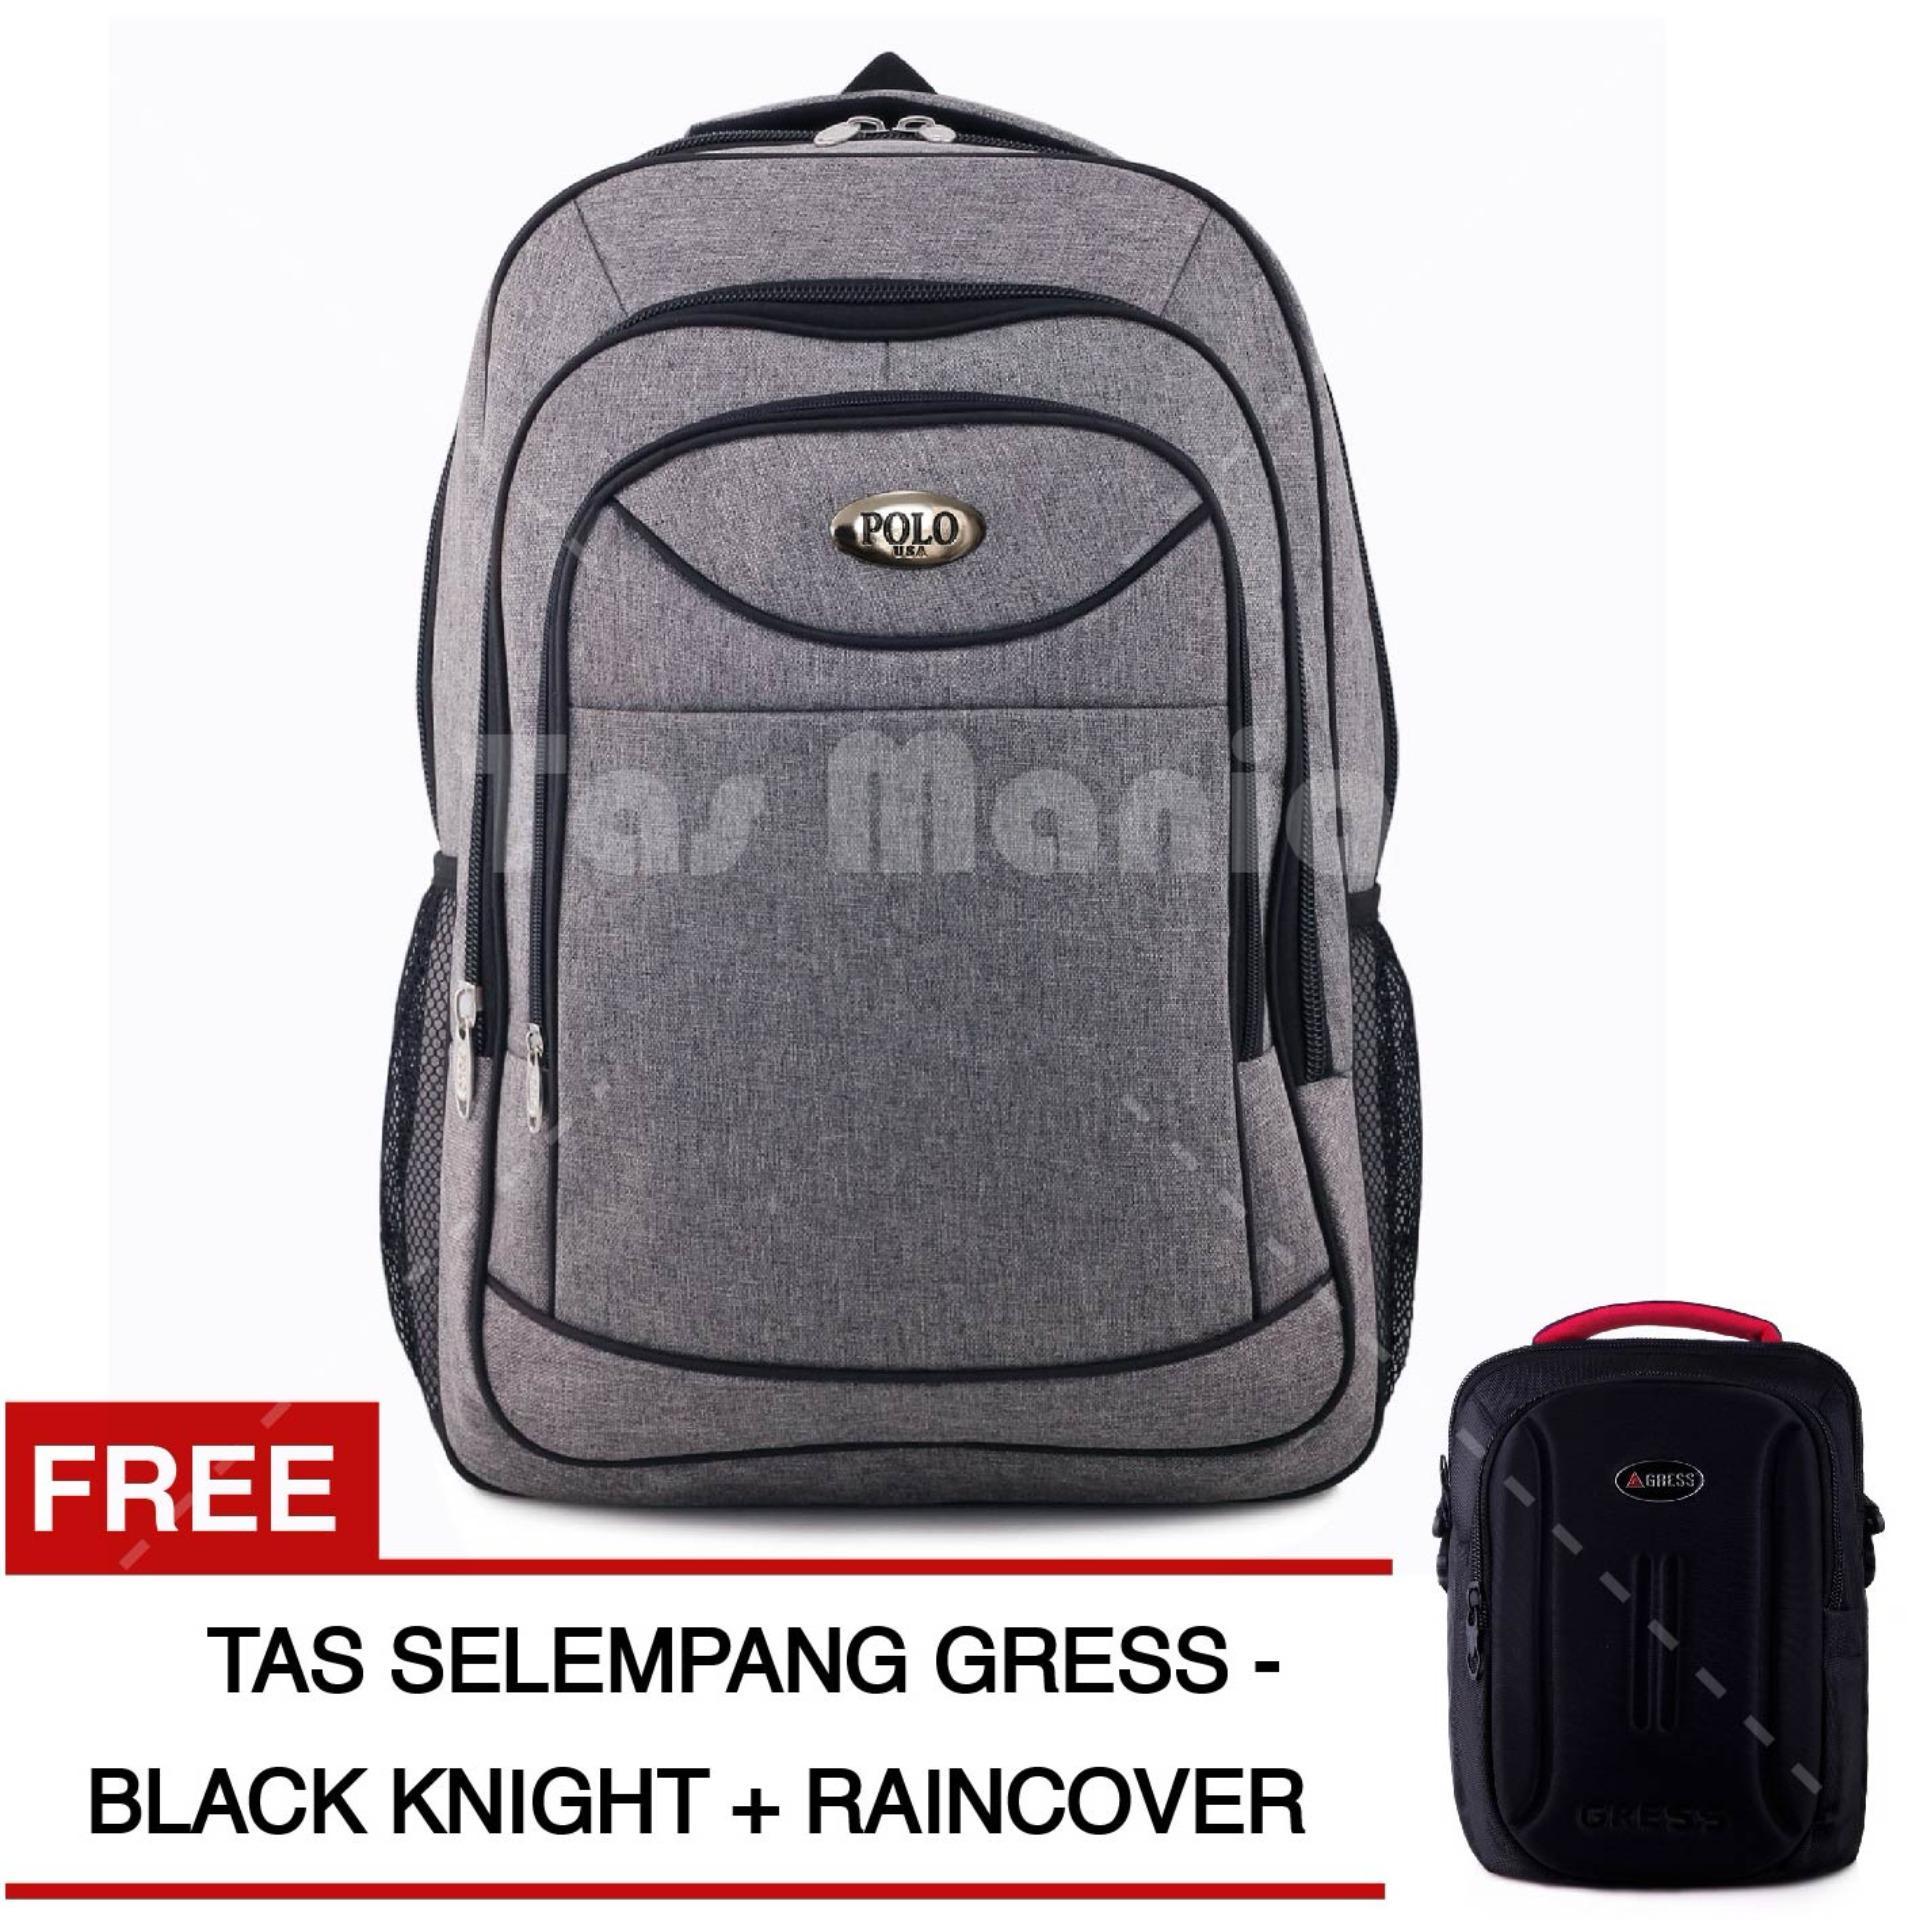 ... Tas Ransel Petal Premium CX-029 Tas Laptop Backpack - LIGHT GREY +  Raincover + f2e1bfa766